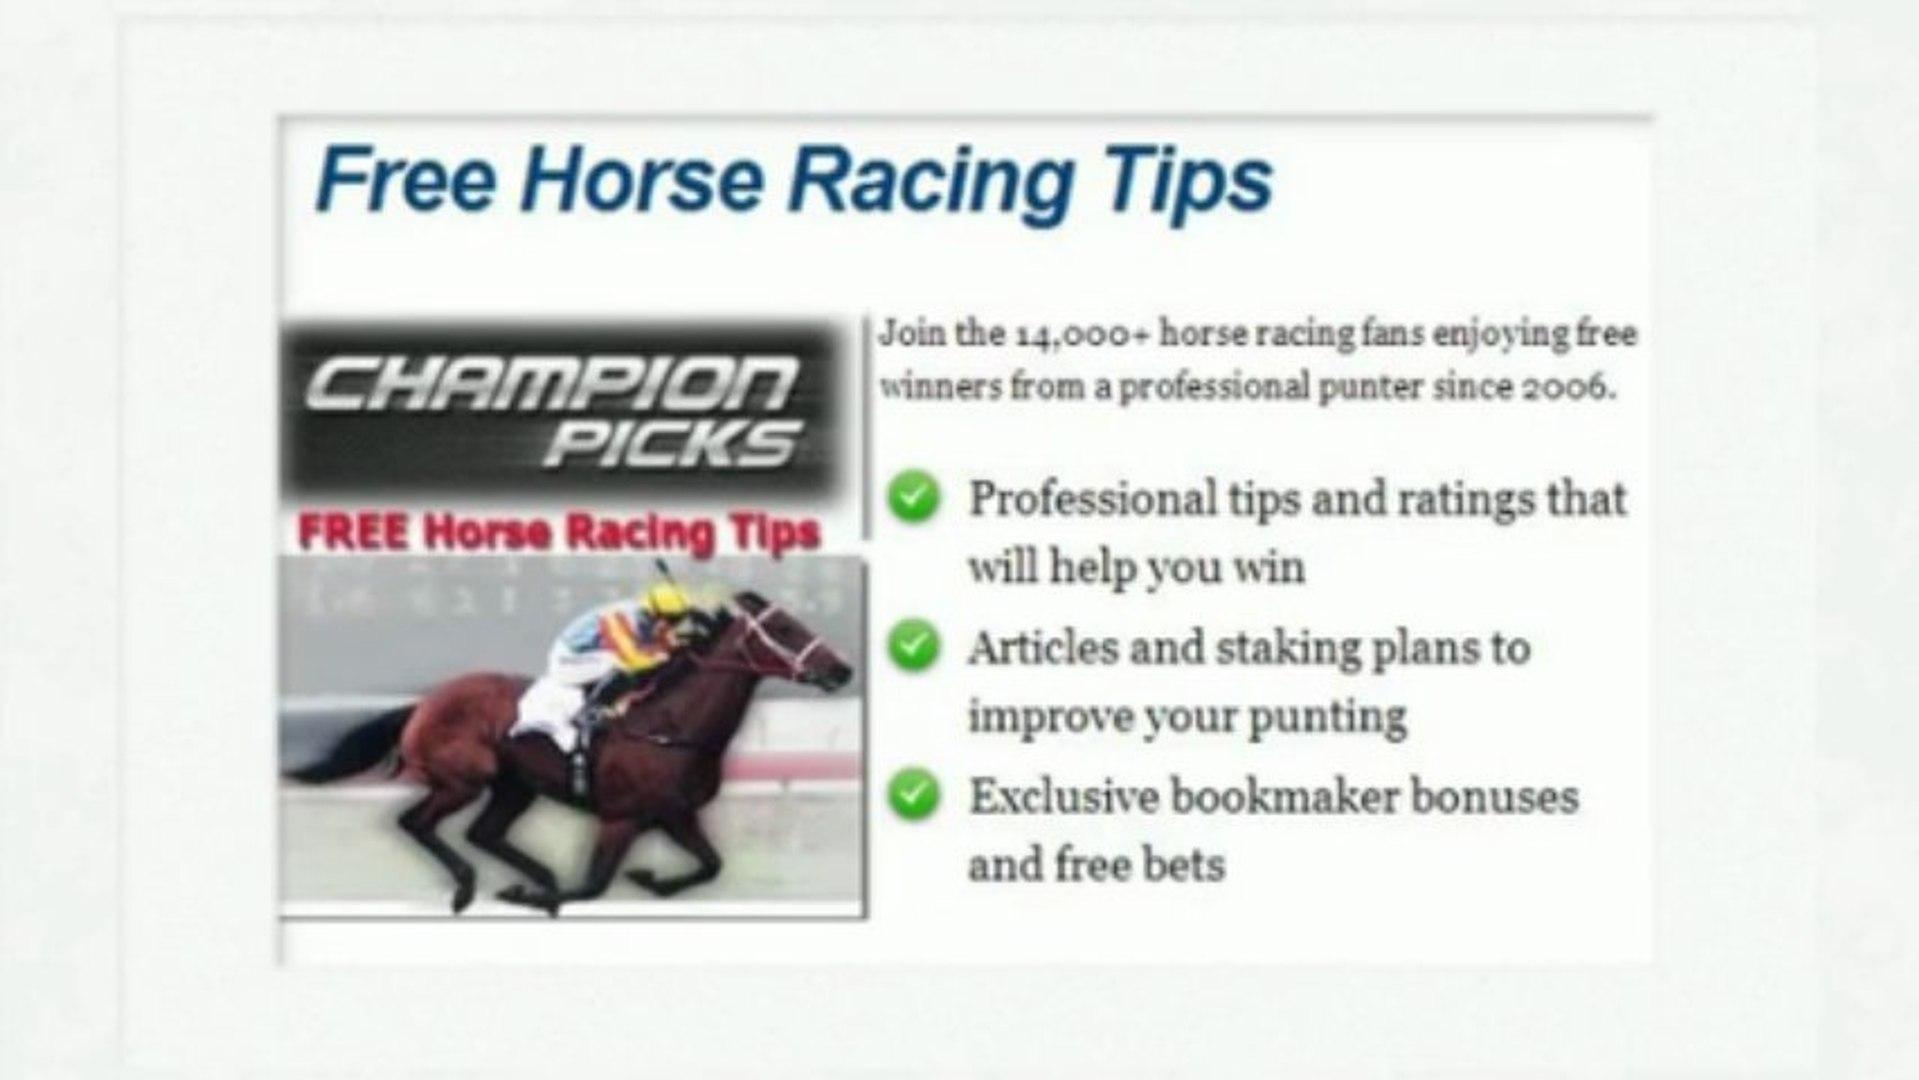 The Professional Punter Horse Racing Staking Plan